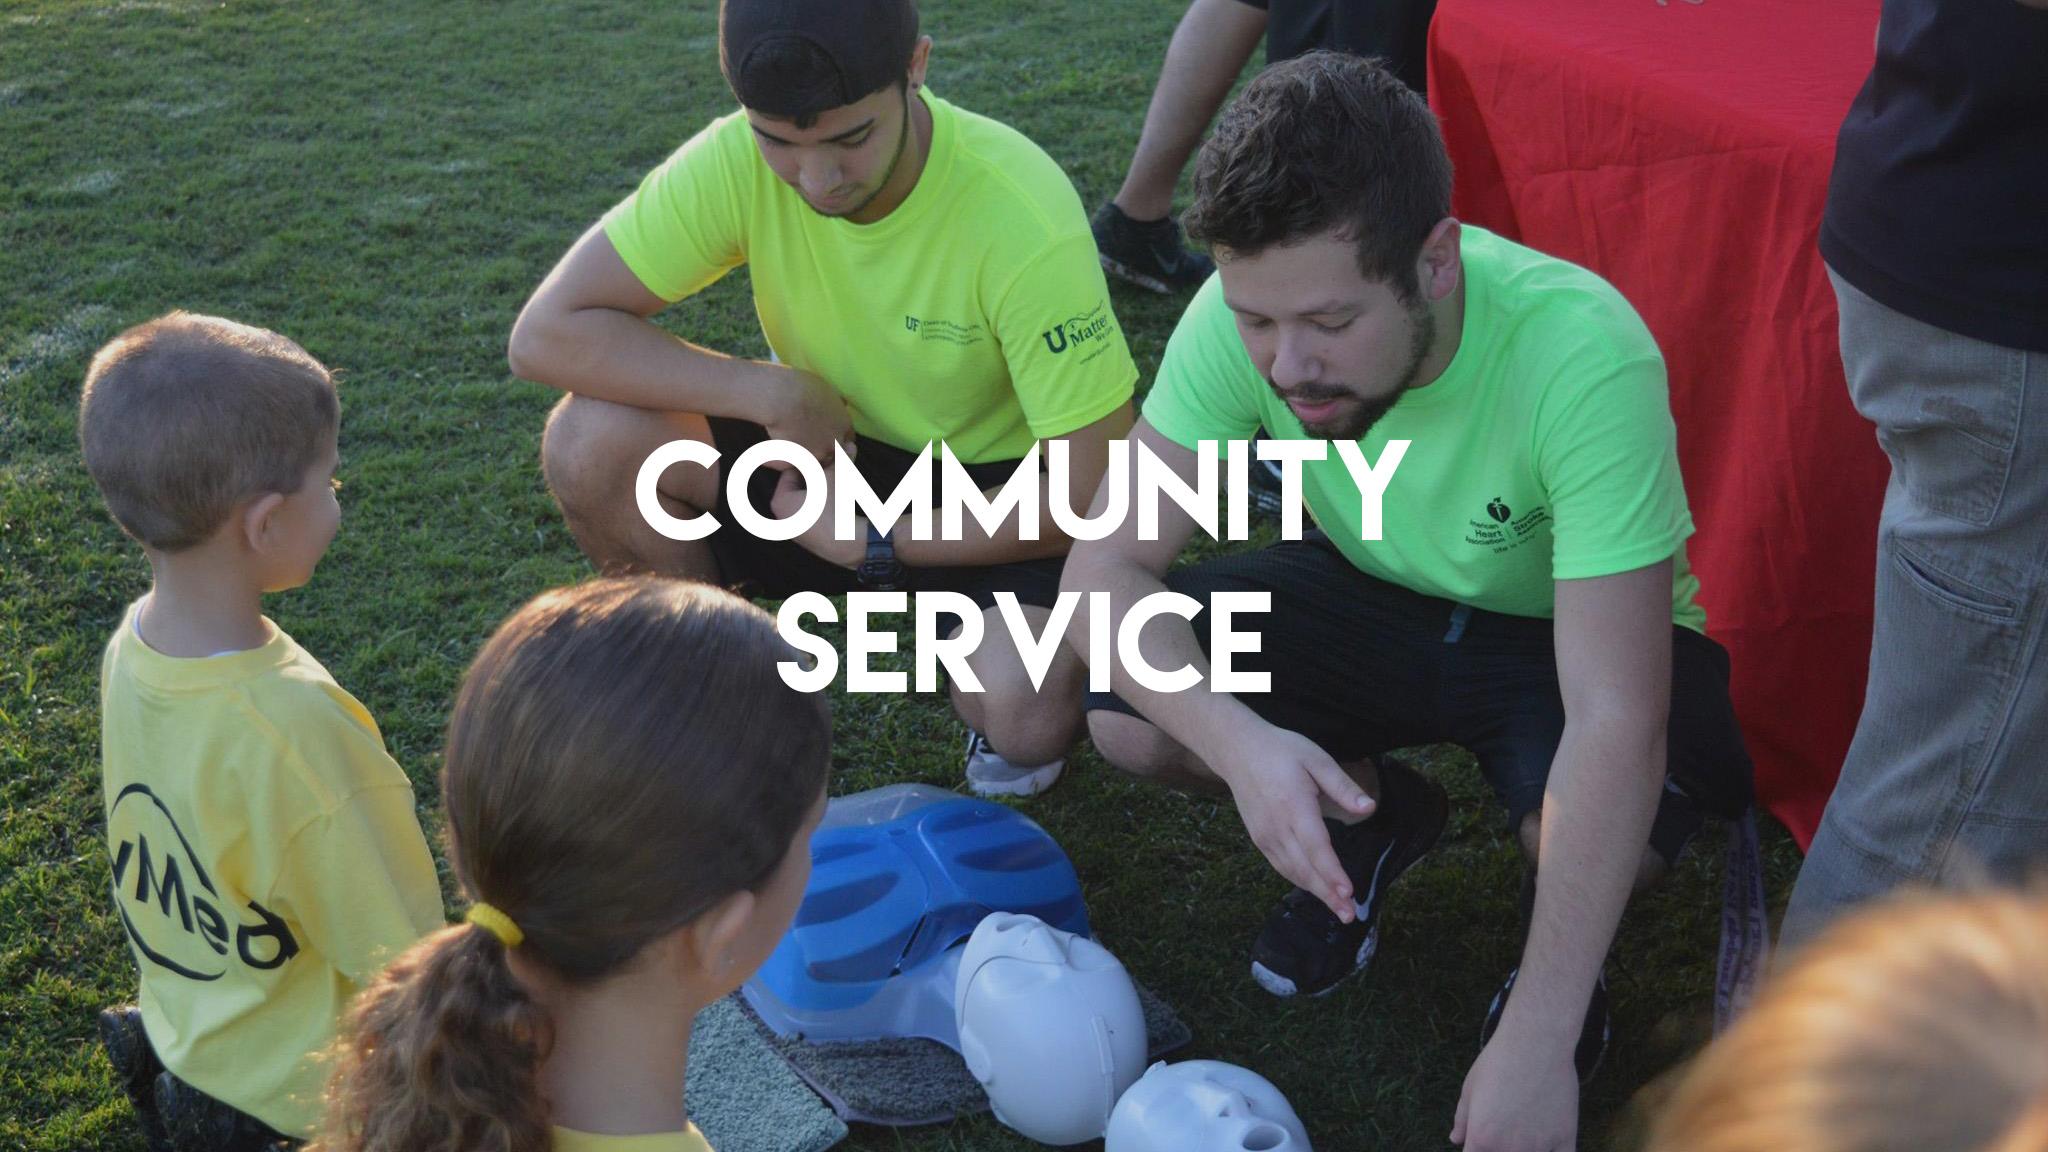 CommunityService.jpg